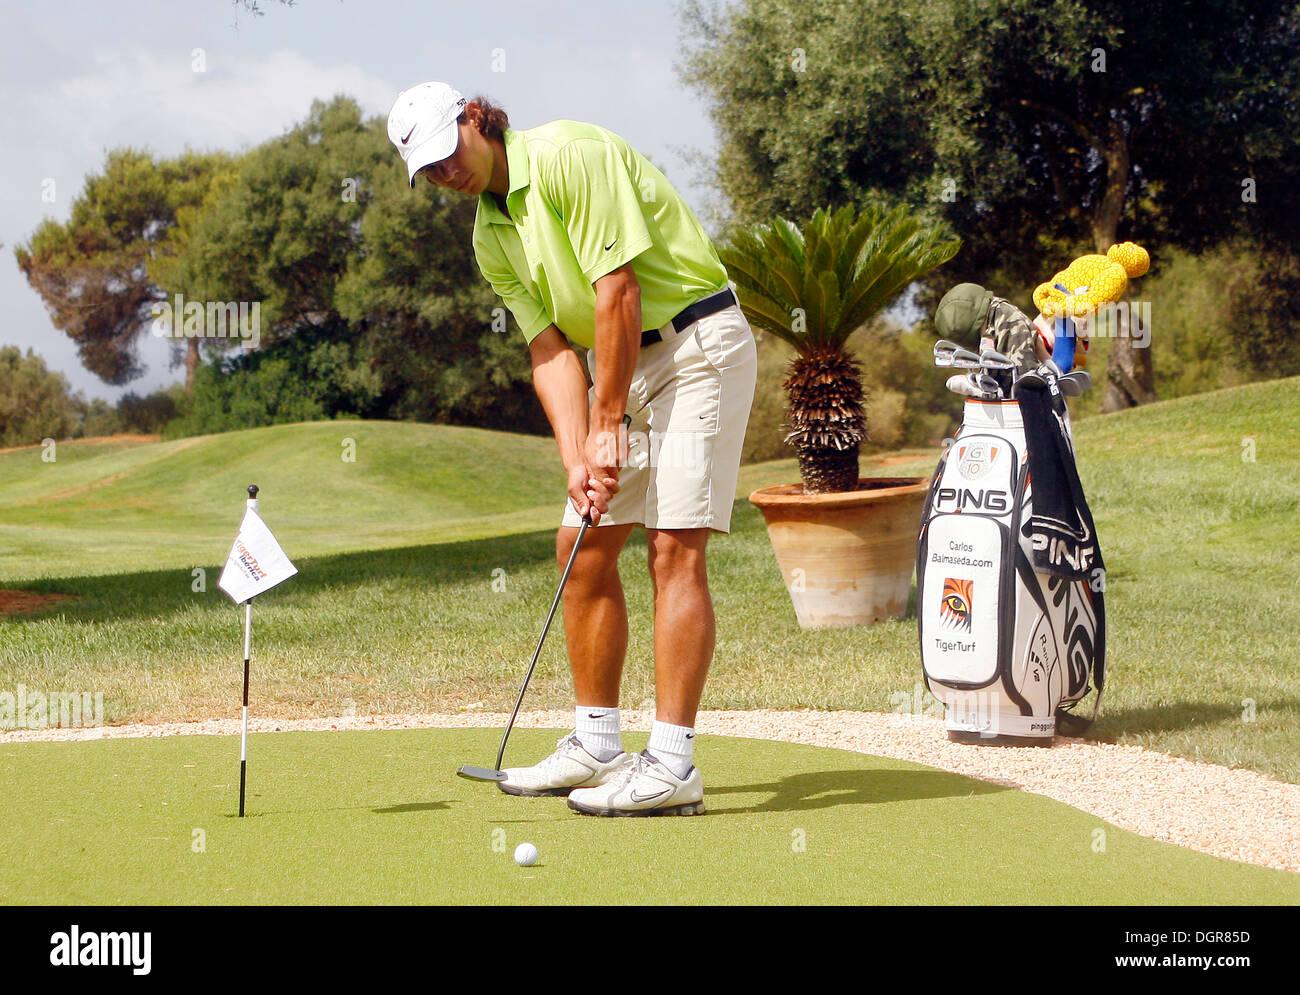 Spain S Tennis Player Rafael Nadal Seen During A Golf Trainig Session Stock Photo Alamy